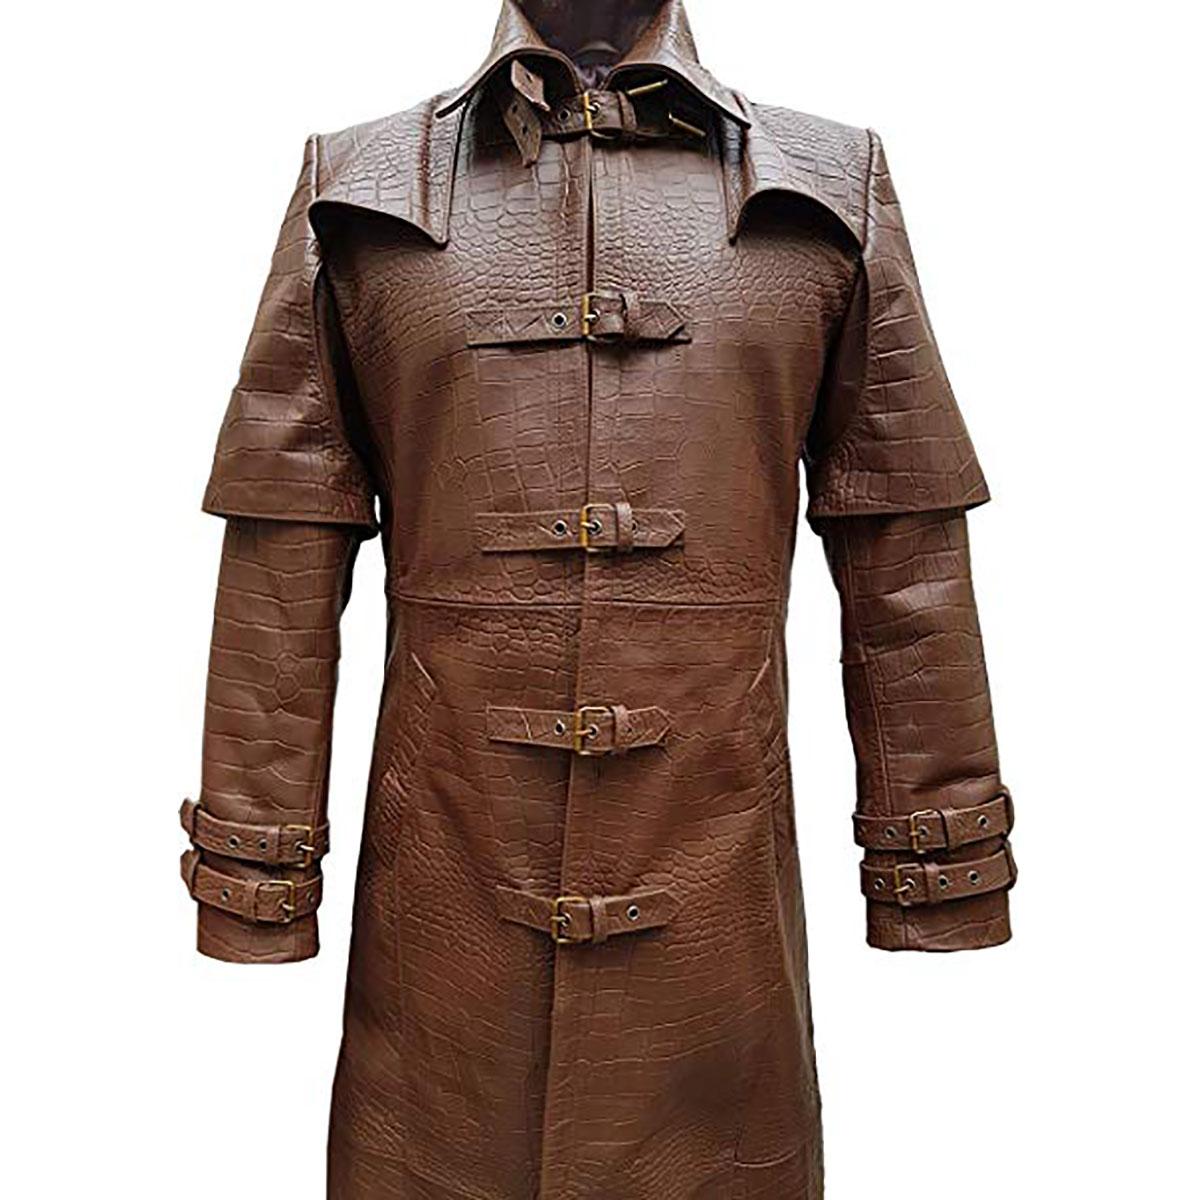 Mens Real Black Cow /& Nubuck Leather Coat Matrix Trench Steampunk Van Helsing